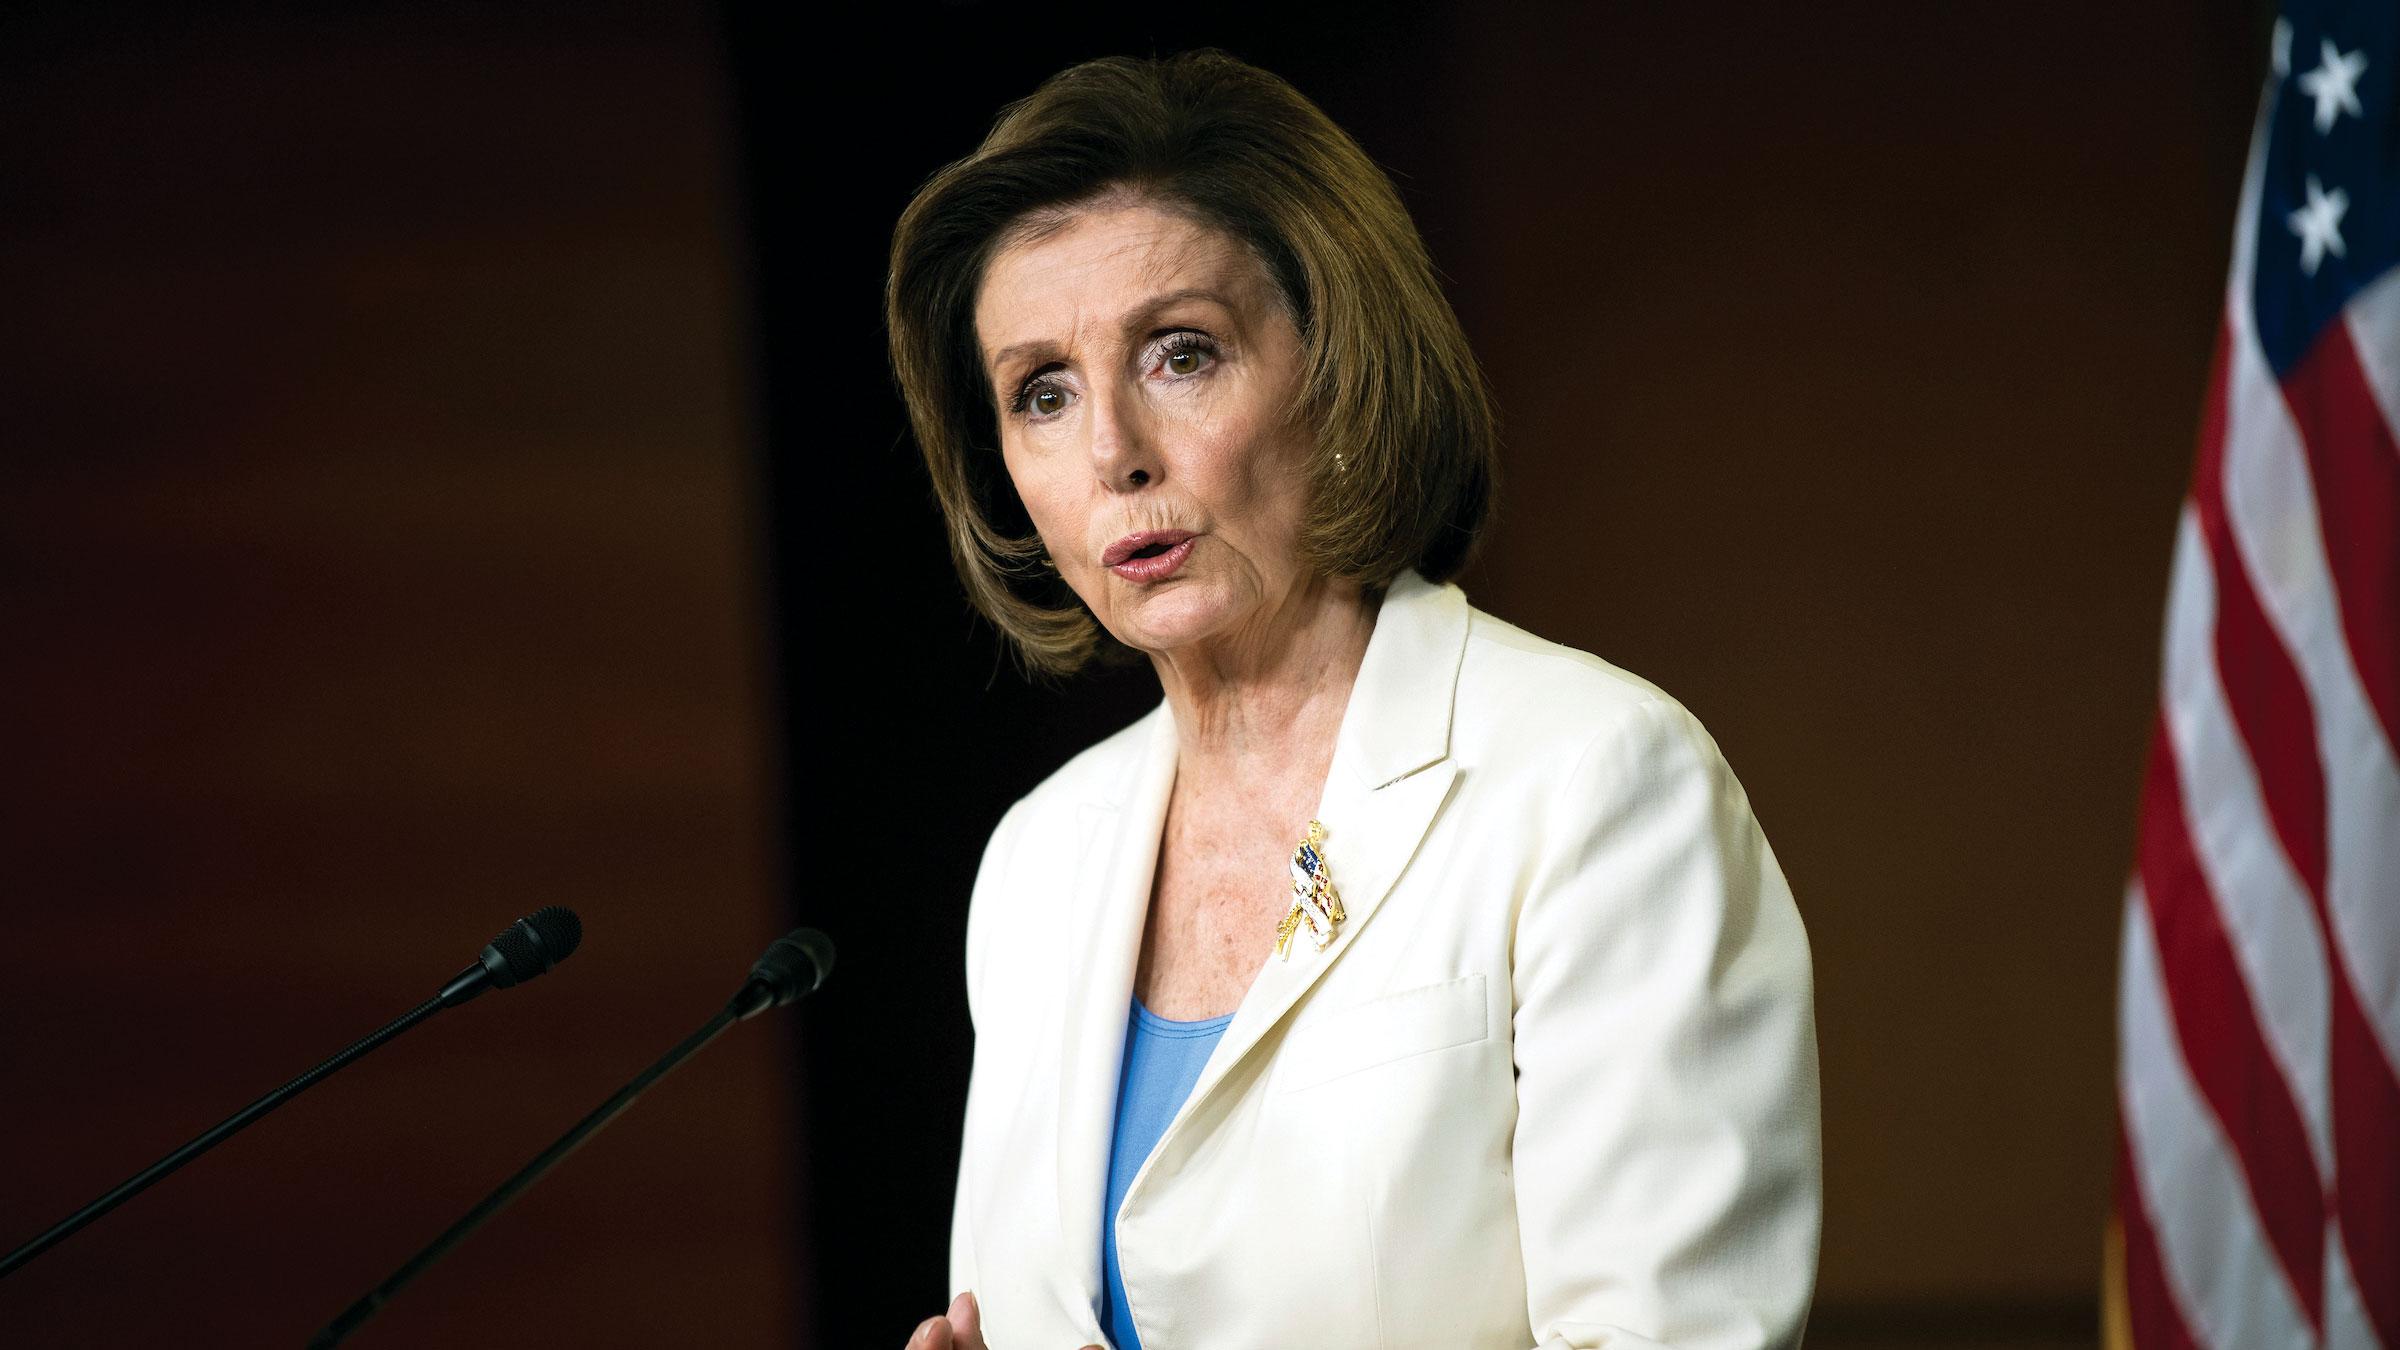 Pelosi announces select committee will investigate Jan. 6 attack